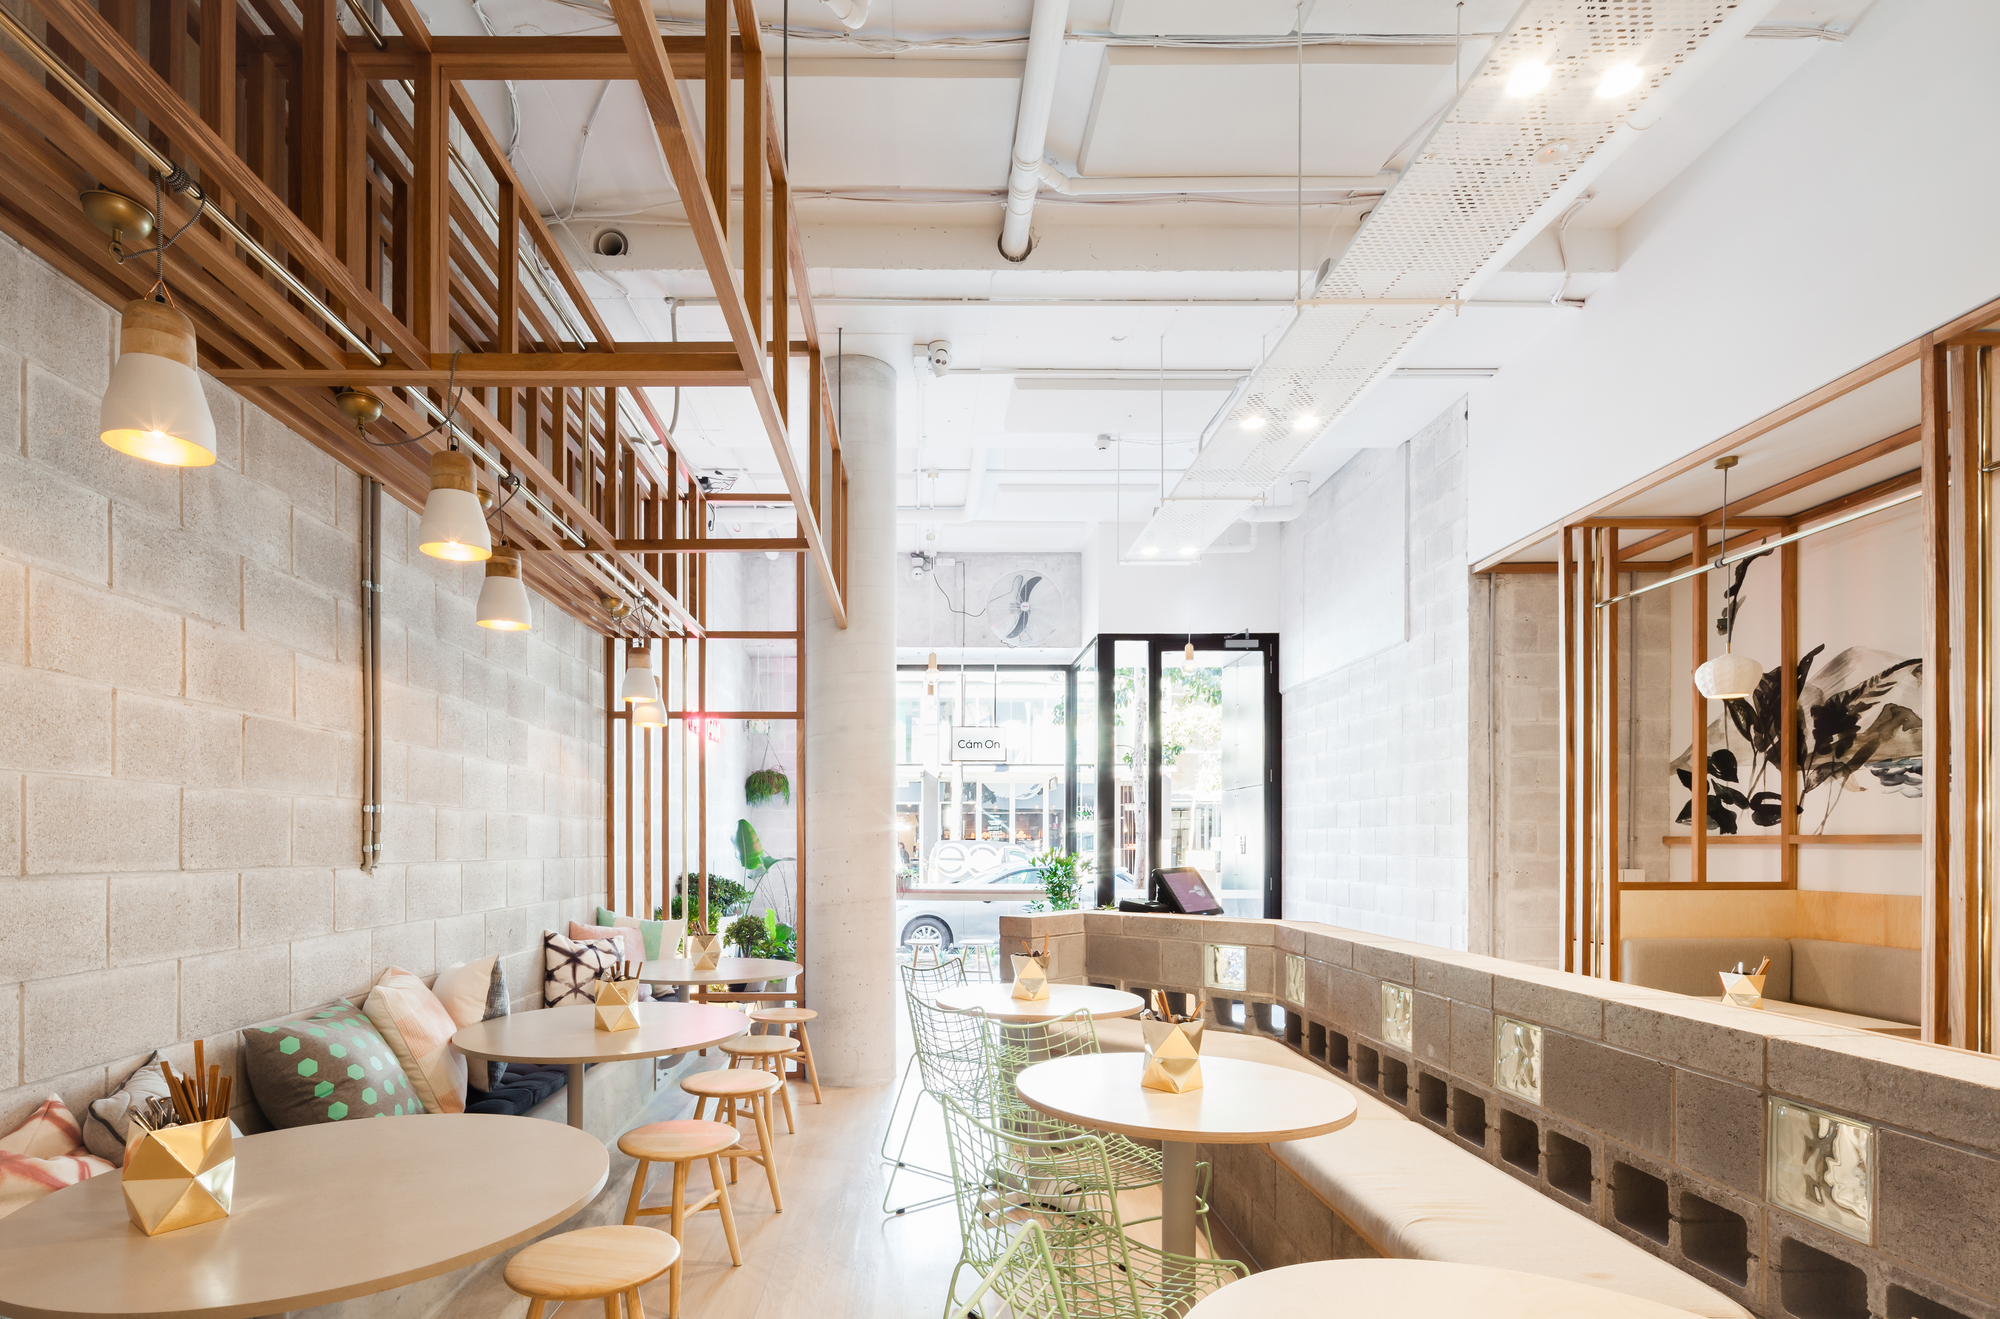 Gallery of restaurant bar design awards announced